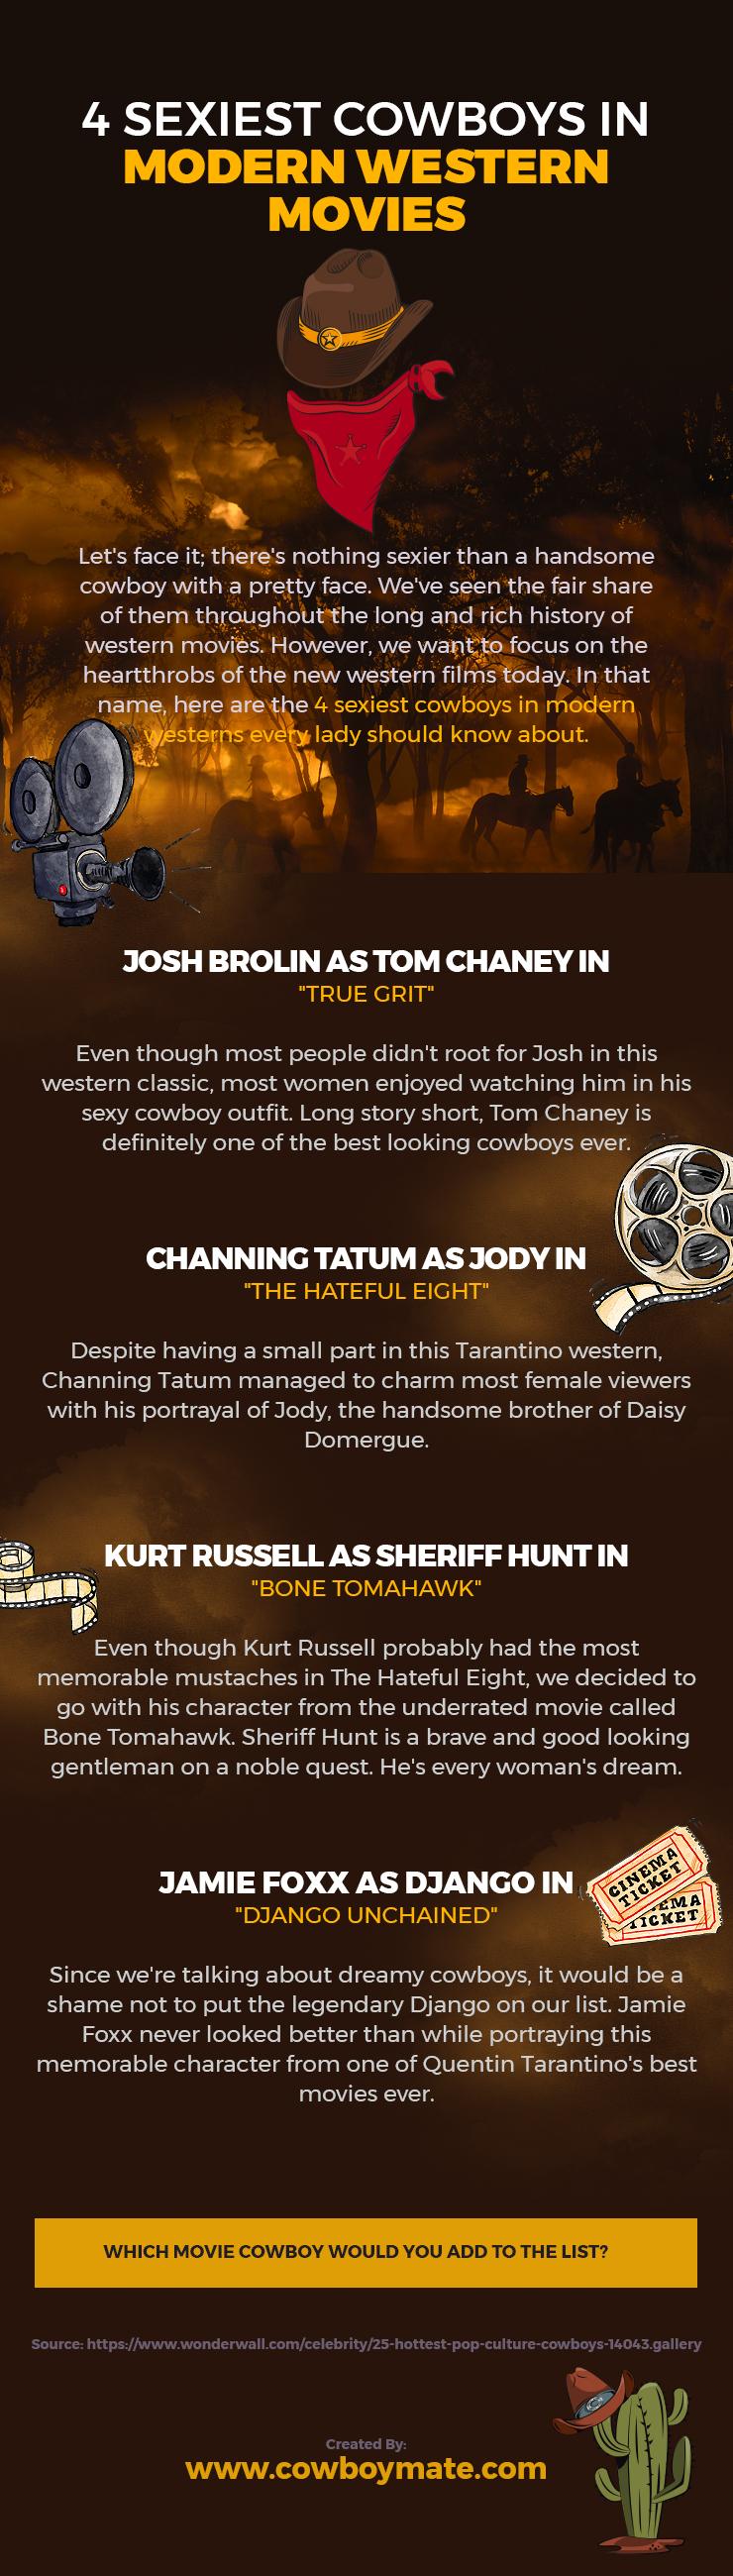 4 Sexiest Cowboys In Modern Western Movies